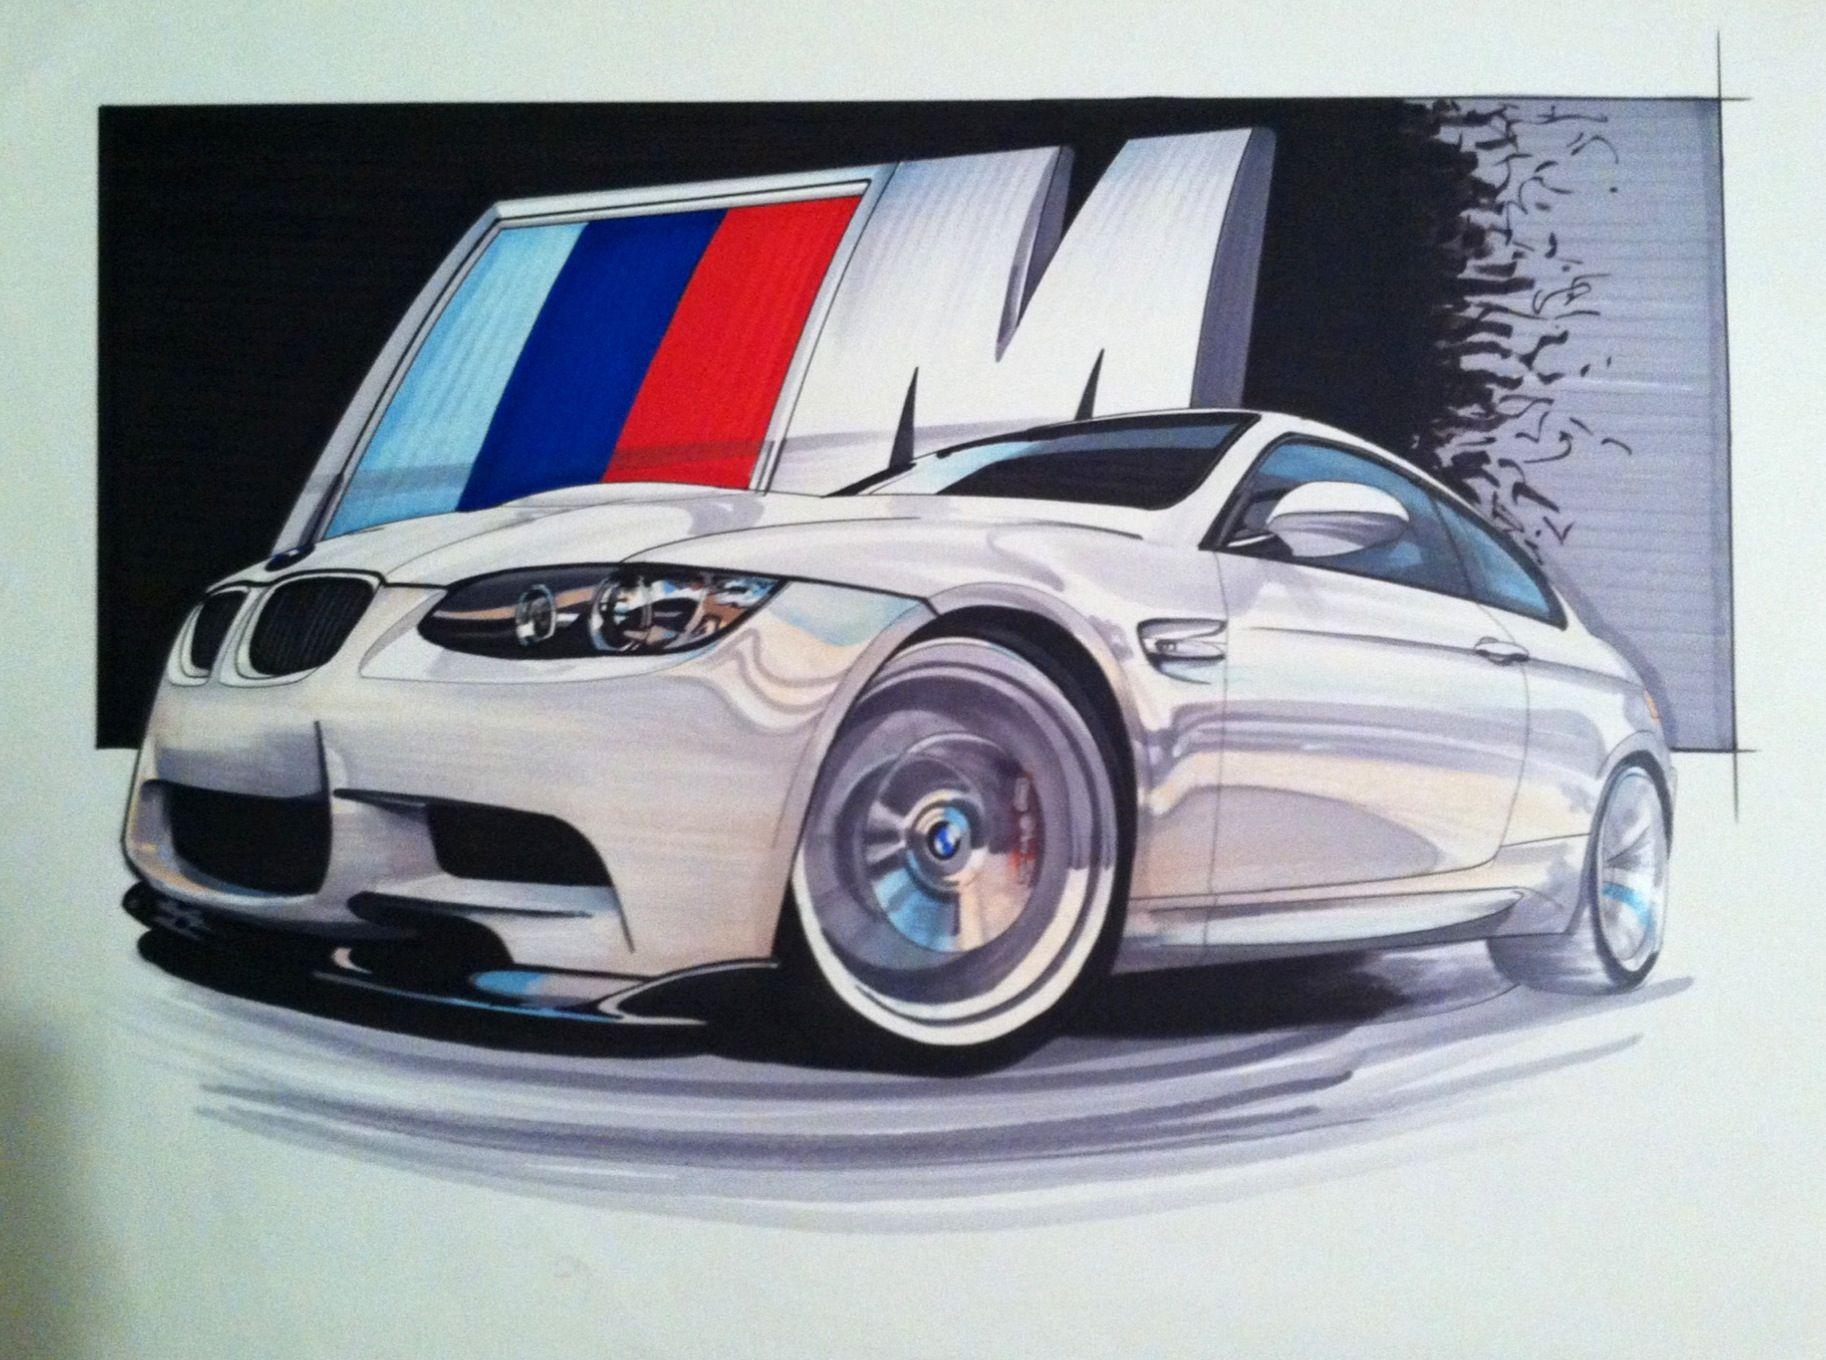 1826x1360 Bmw M3 Drawing With Marker Artwork Bmw M3